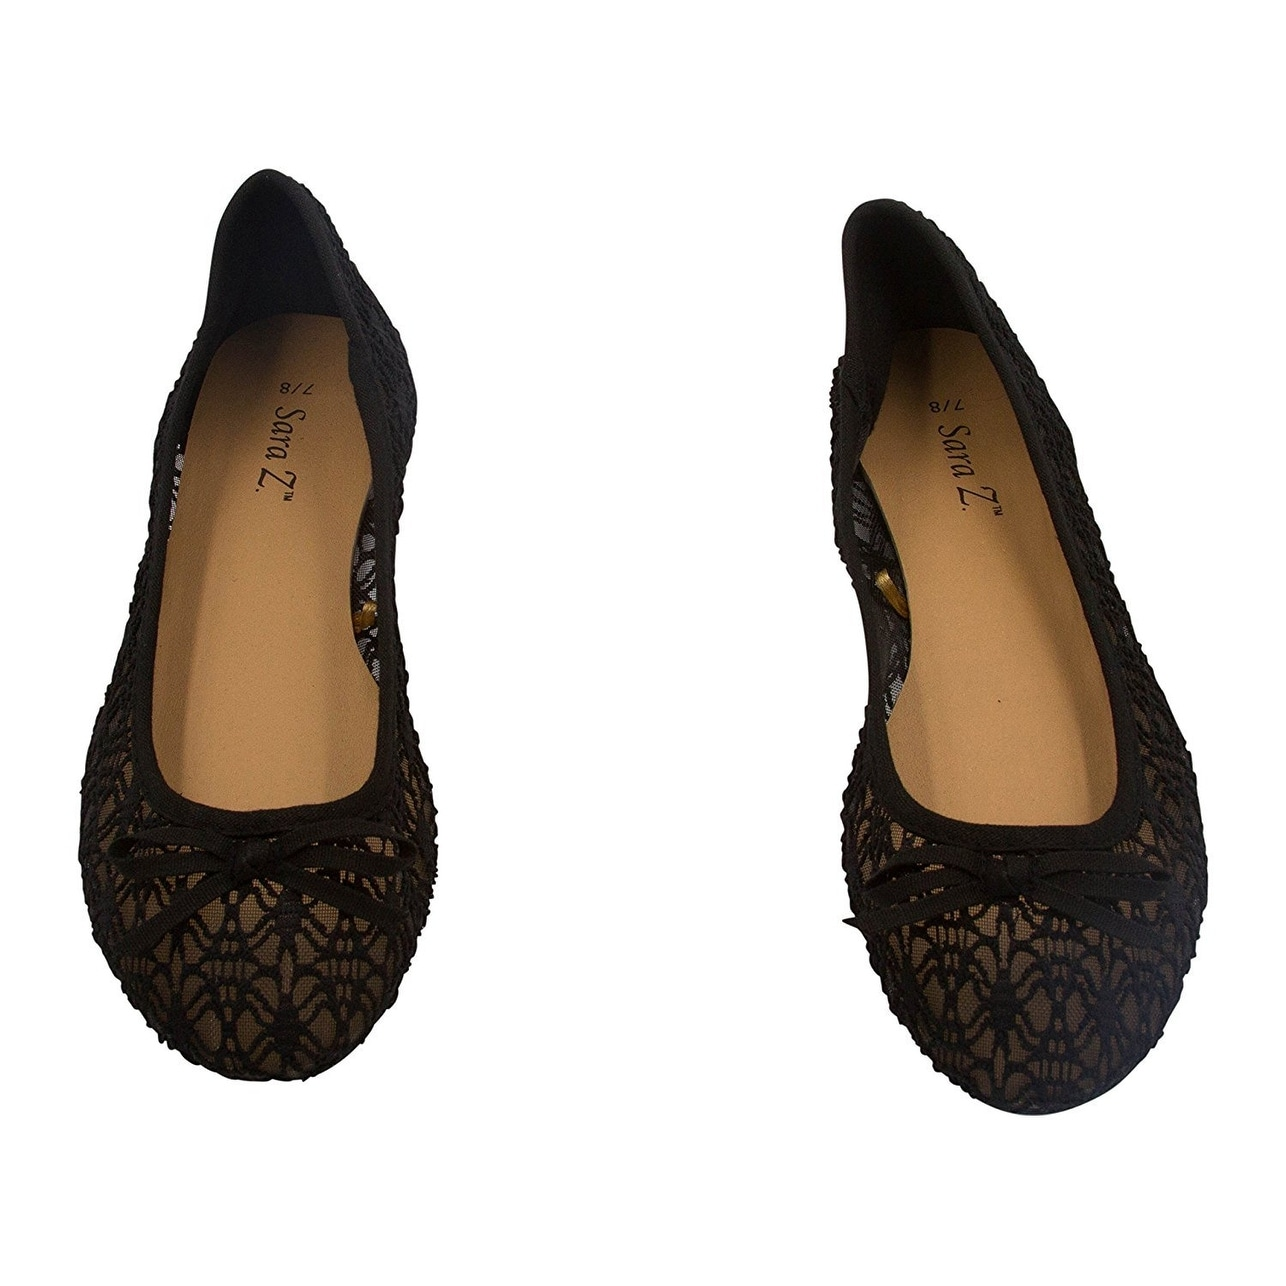 Sara Z Womens Fashion Casual Slip-On Classic Satin Ballet Flat Shoes